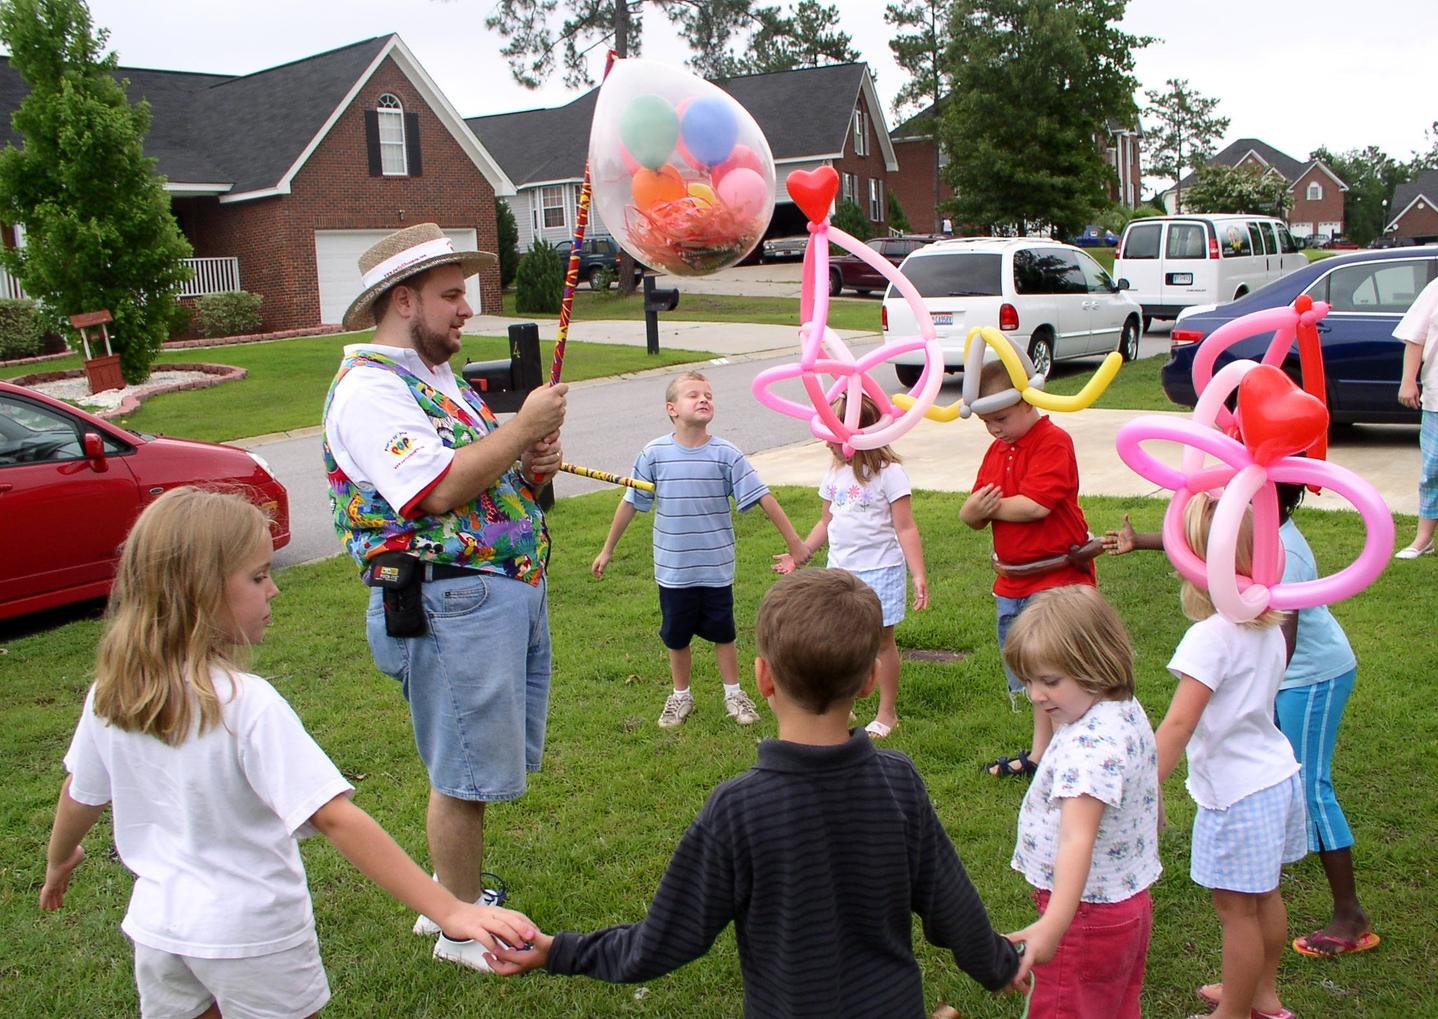 Balloonyatta circle